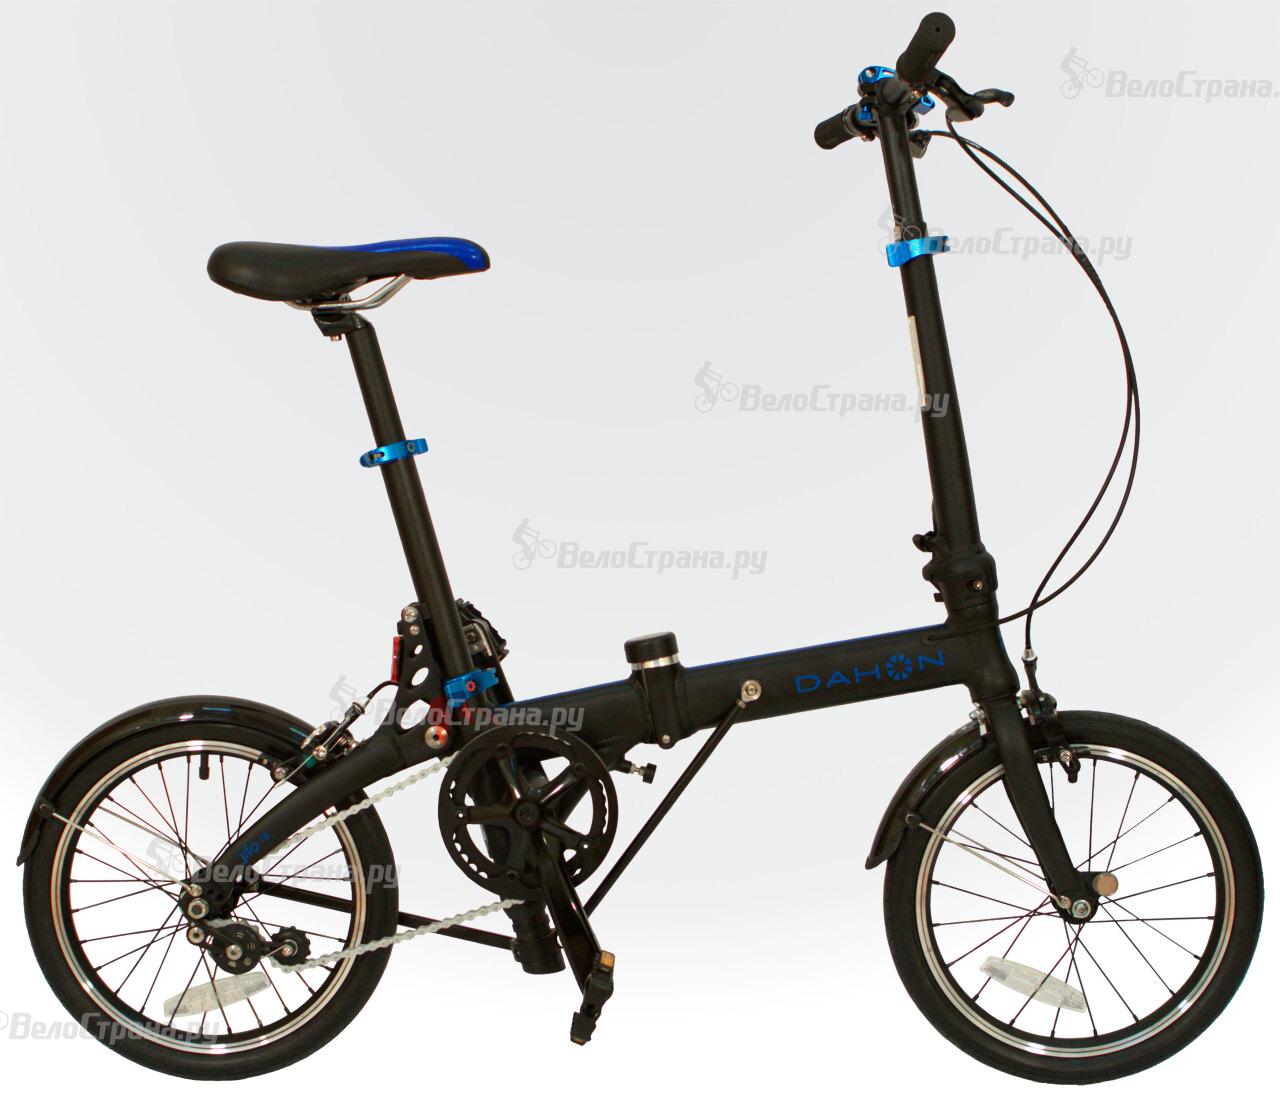 Велосипед Dahon Jifo Uno (2015) велосипед dahon vybe d7 u 2017